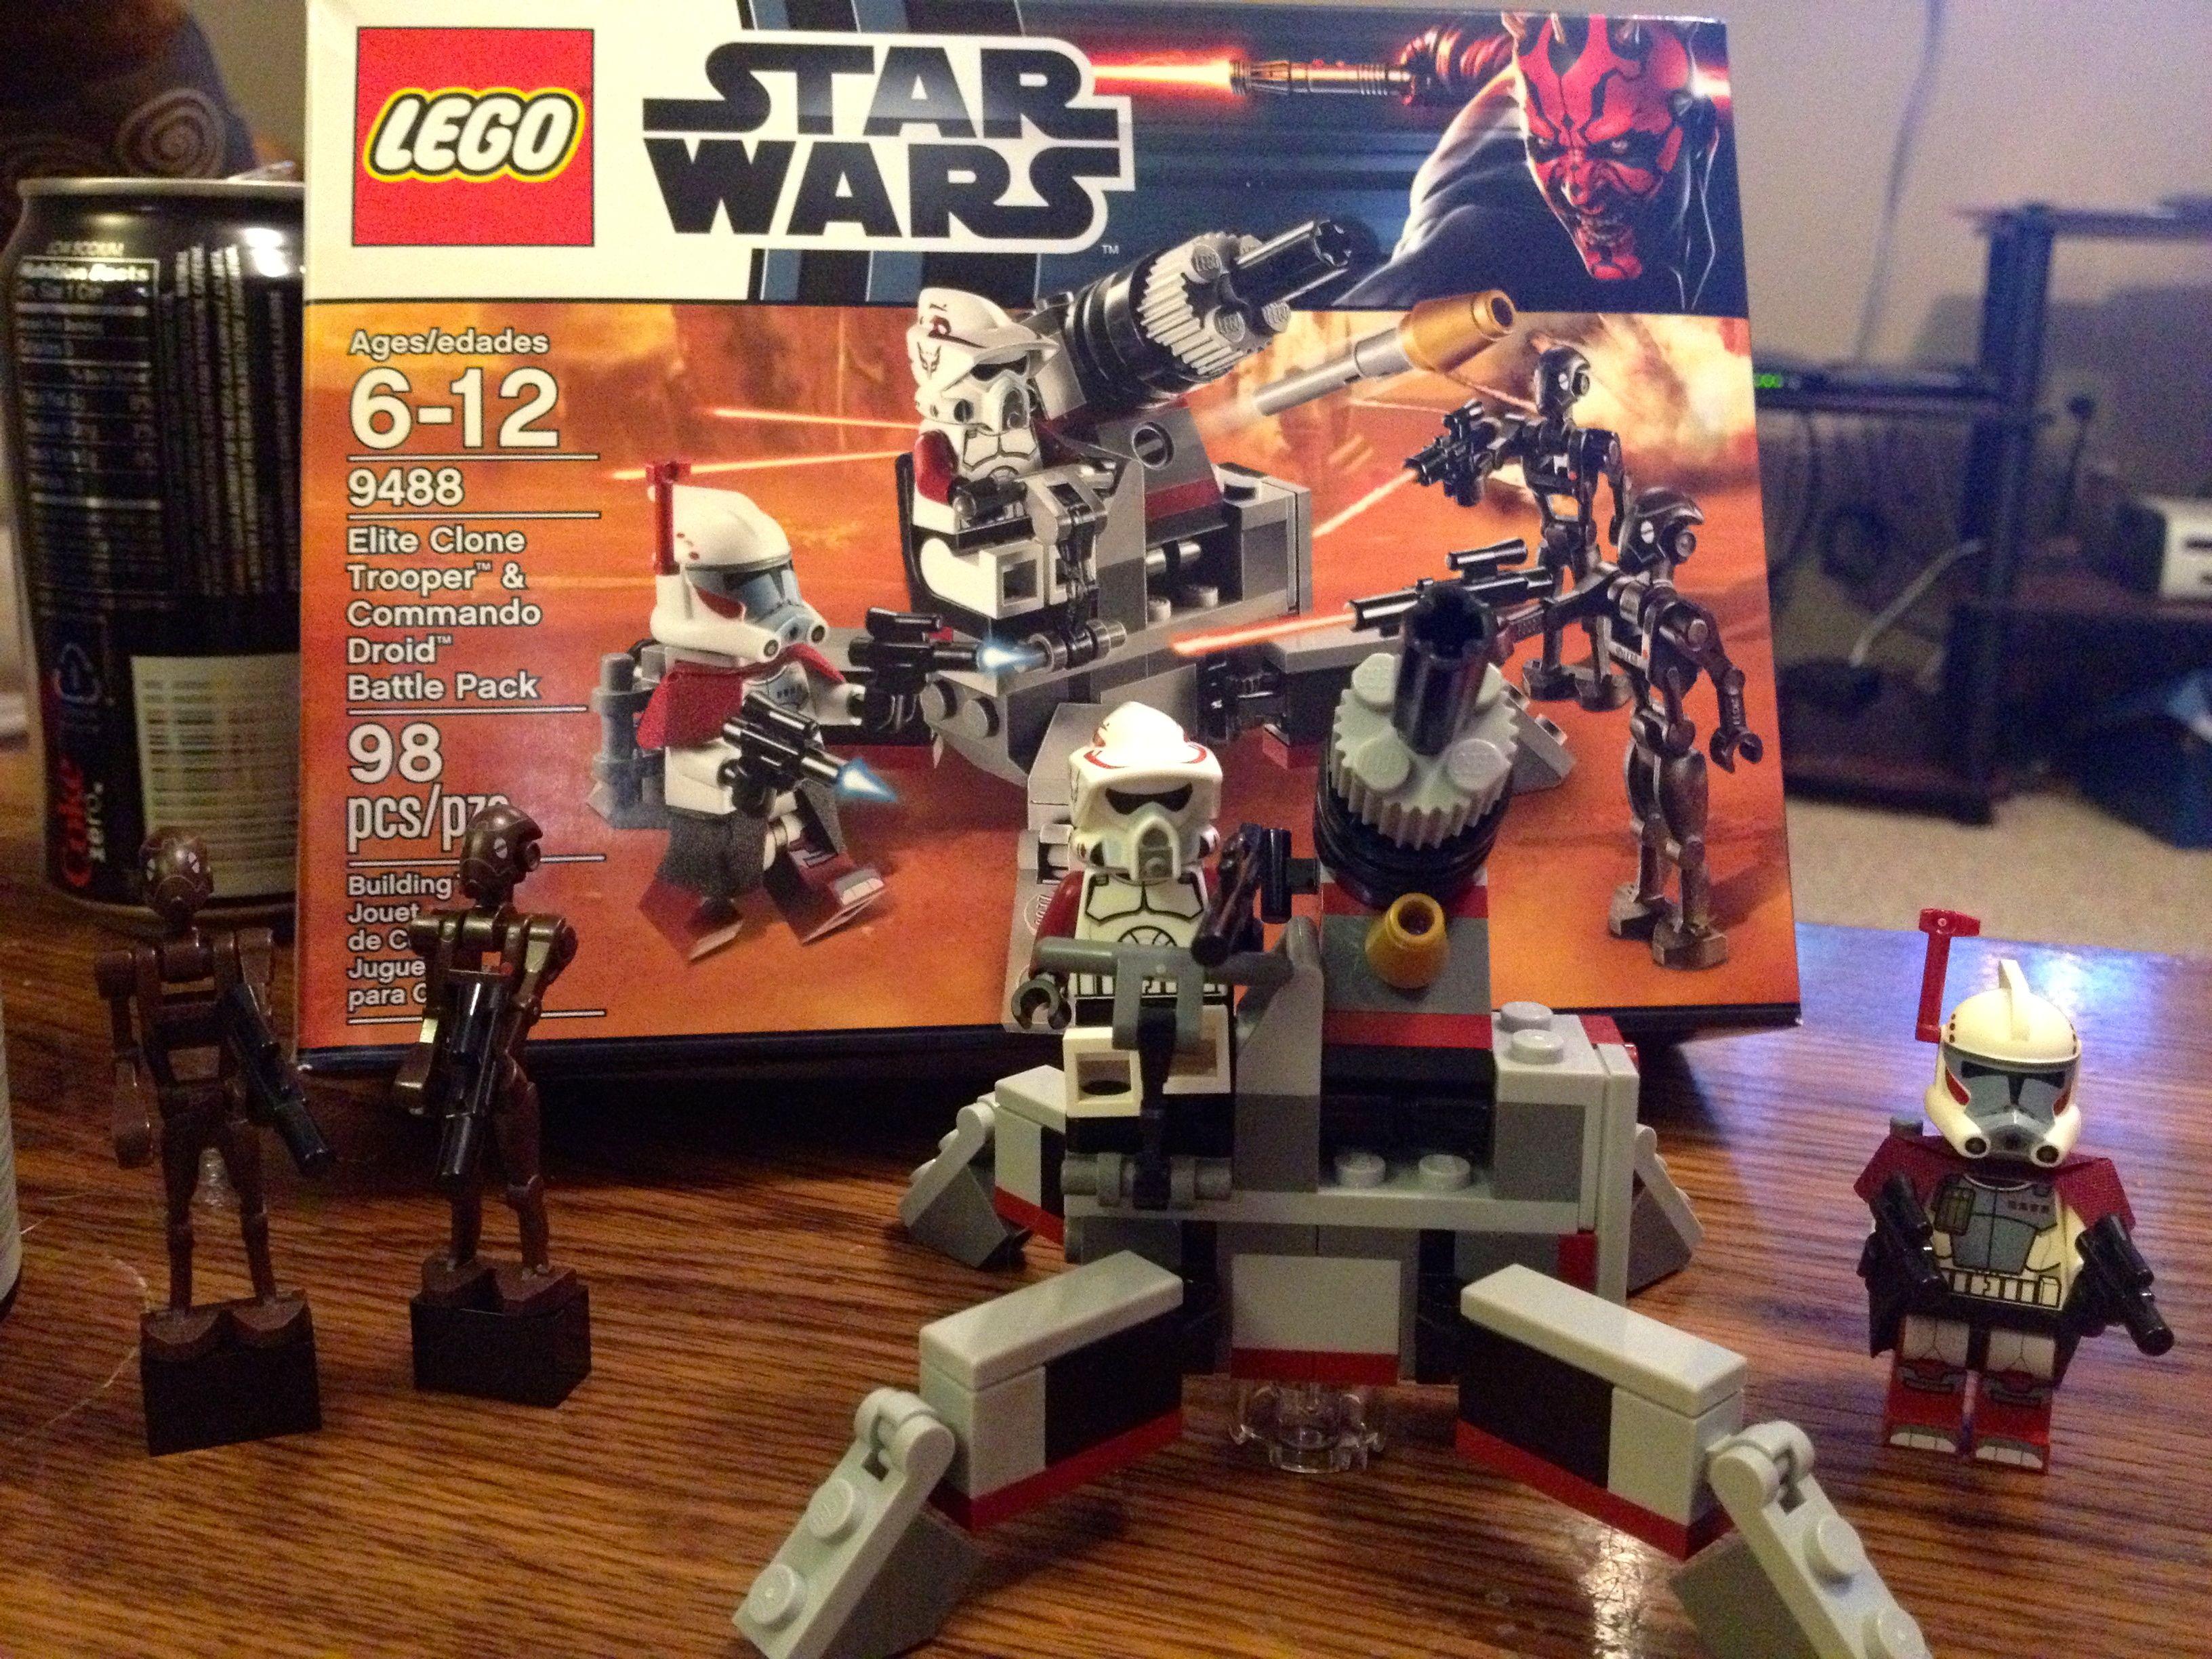 Lego Star Wars Centerpiece Video game wedding, Lego star